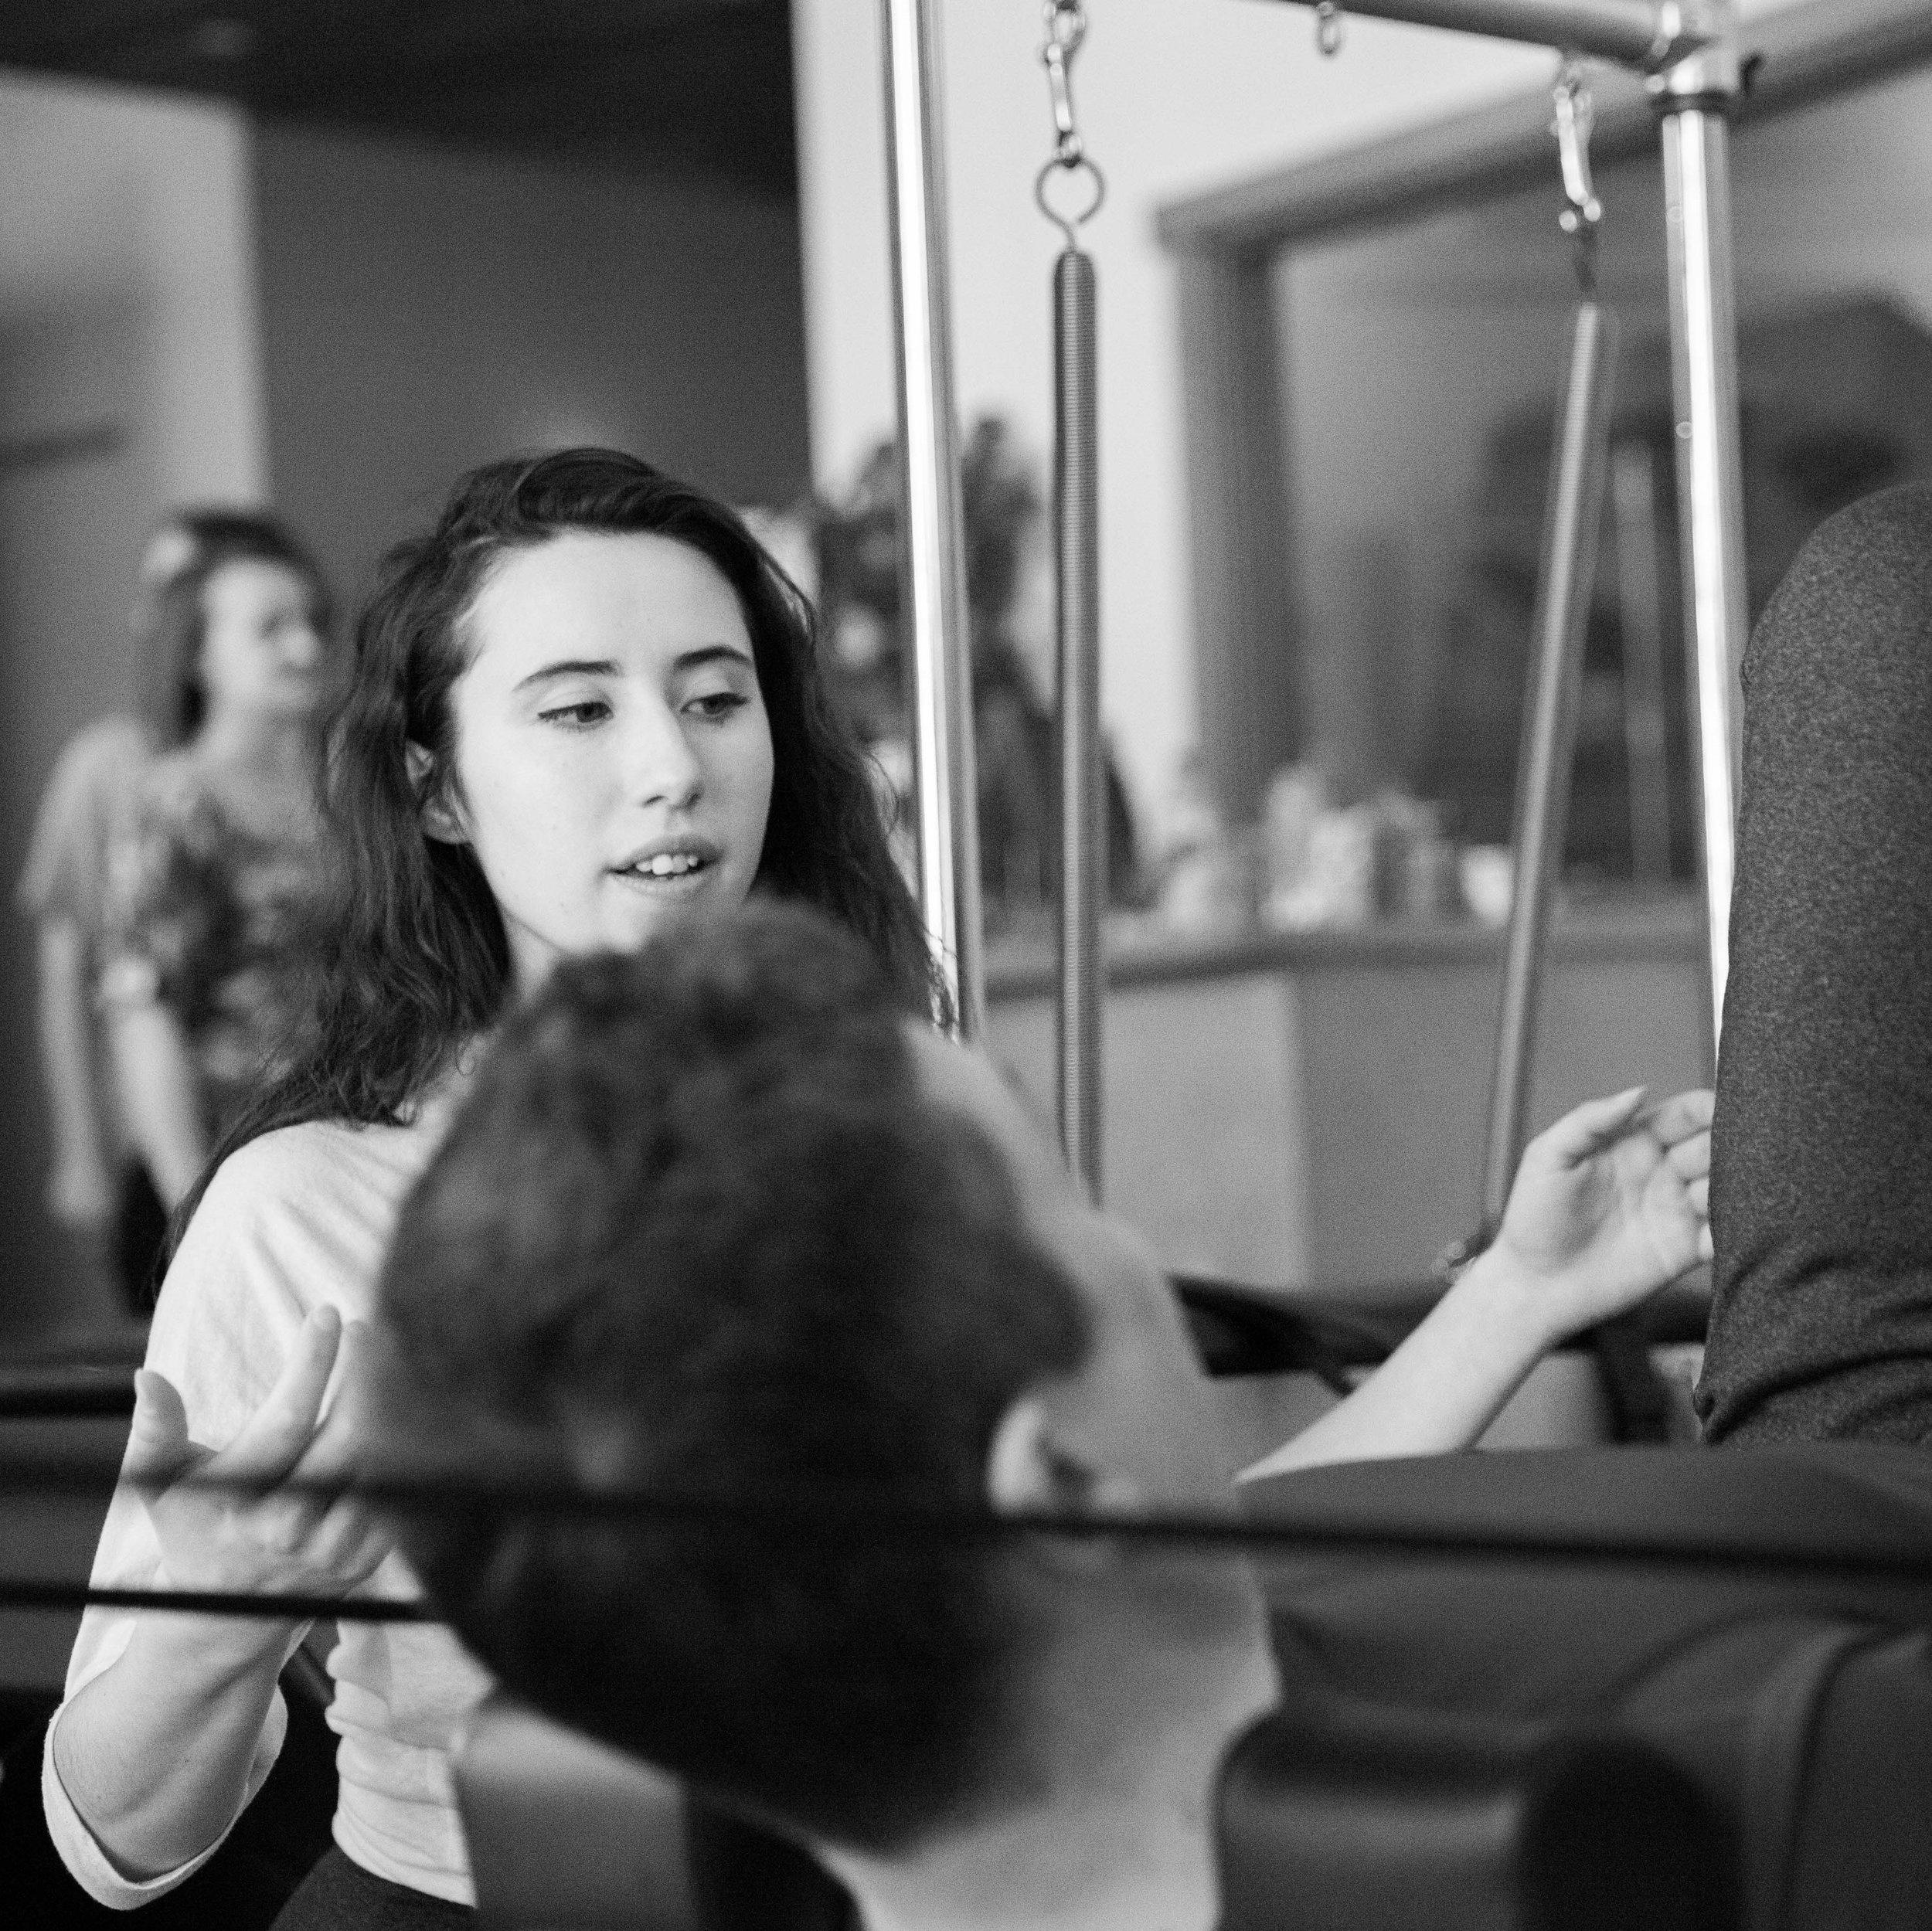 Alex-Grosssman-Pilates-Instructor-Seattle